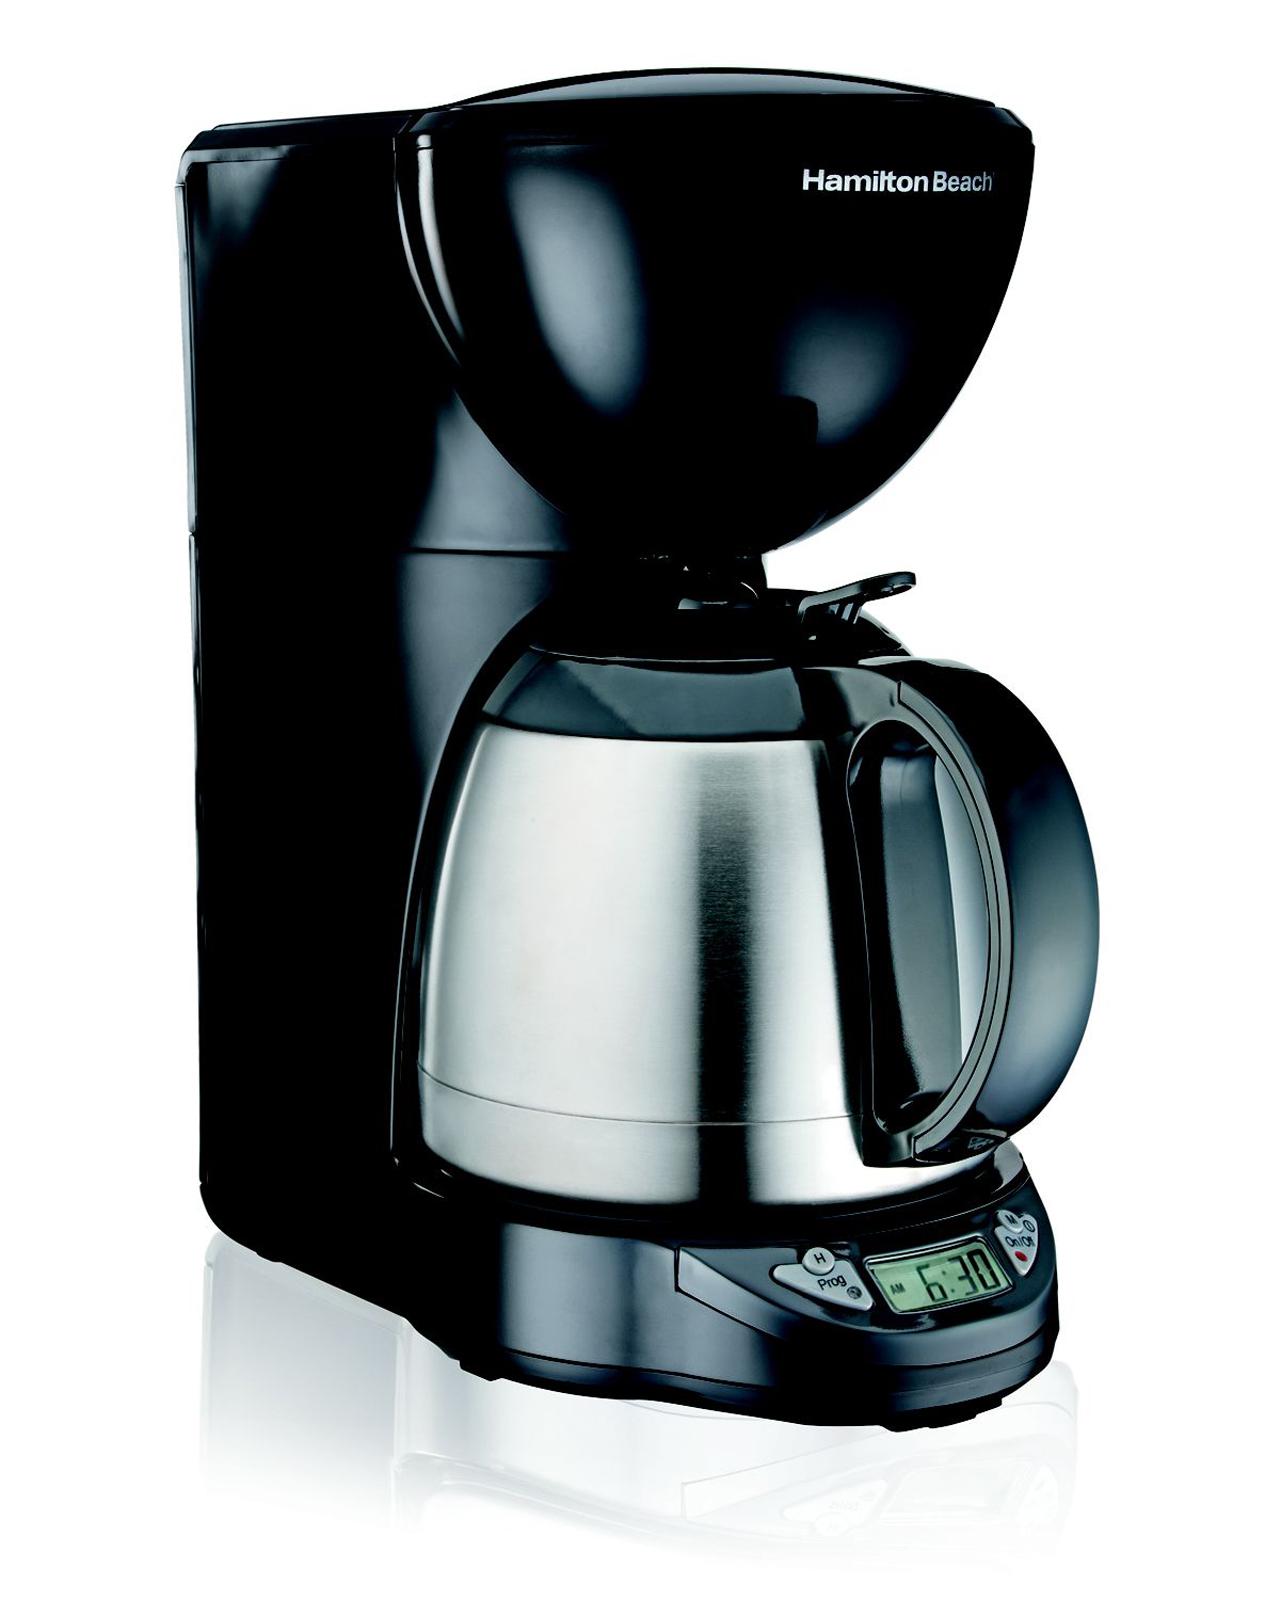 Hamilton Beach Programmable Thermal 10-Cup Coffeemaker